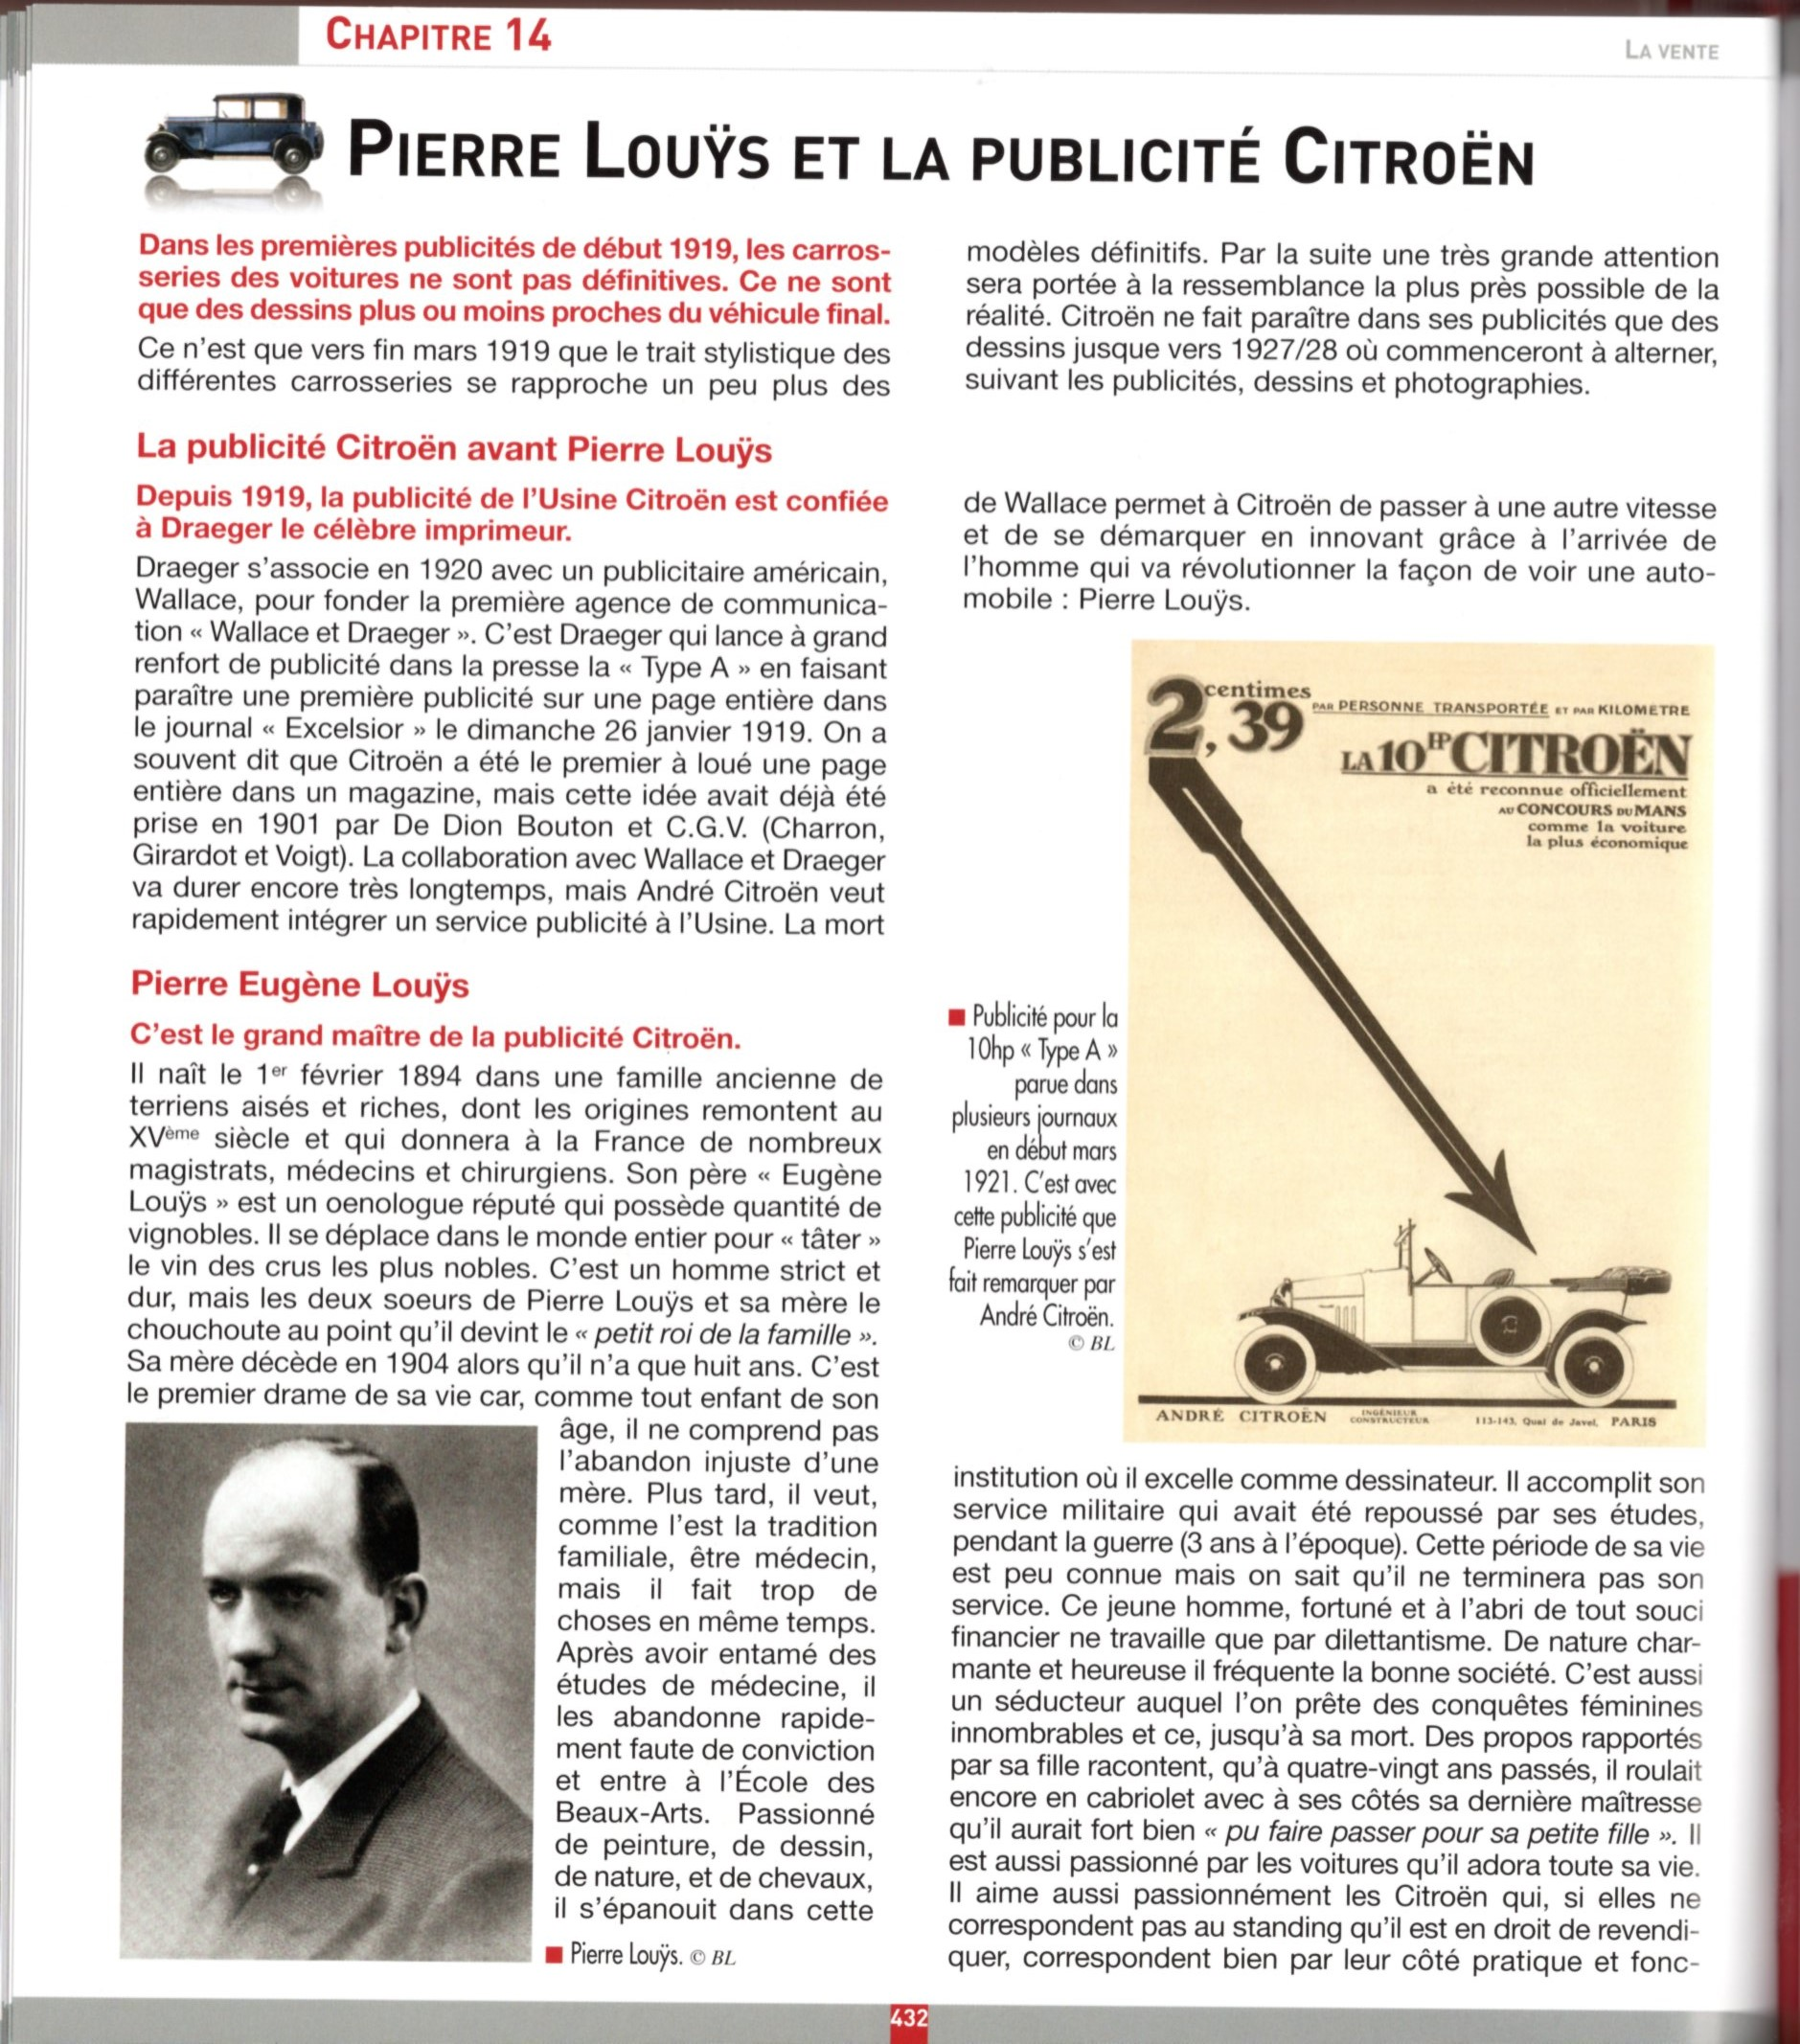 p.432